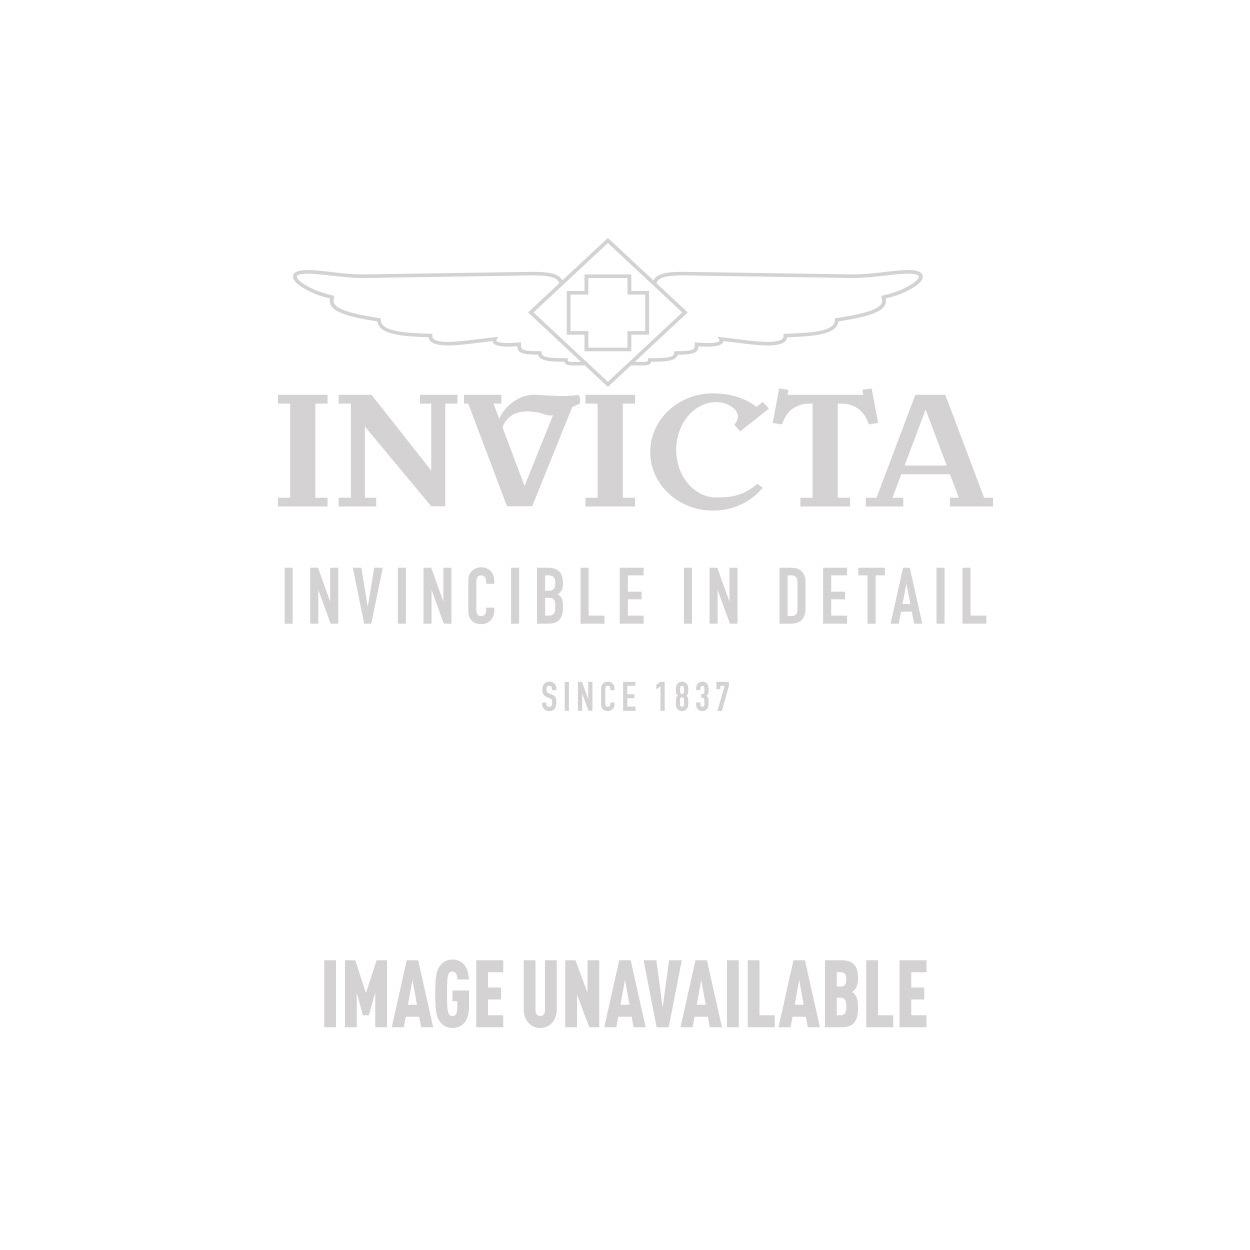 Invicta Subaqua Swiss Made Quartz Watch - Black case with Black tone Stainless Steel, Polyurethane band - Model 0736